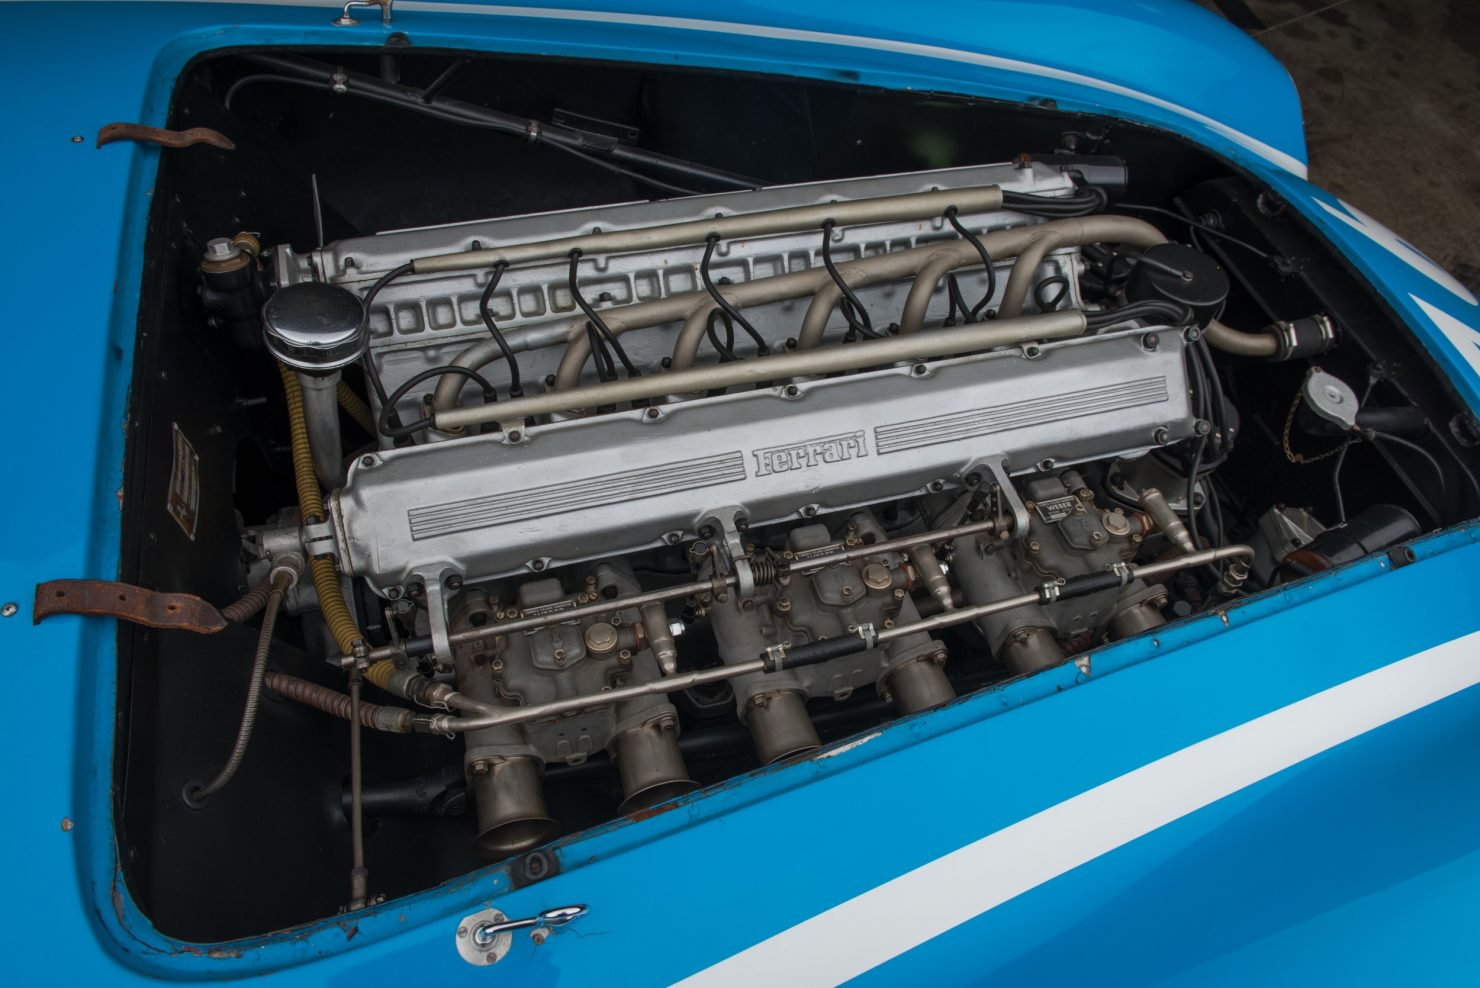 ferrari 121 lm spider 3 1480x988 - 1955 Ferrari 121 LM